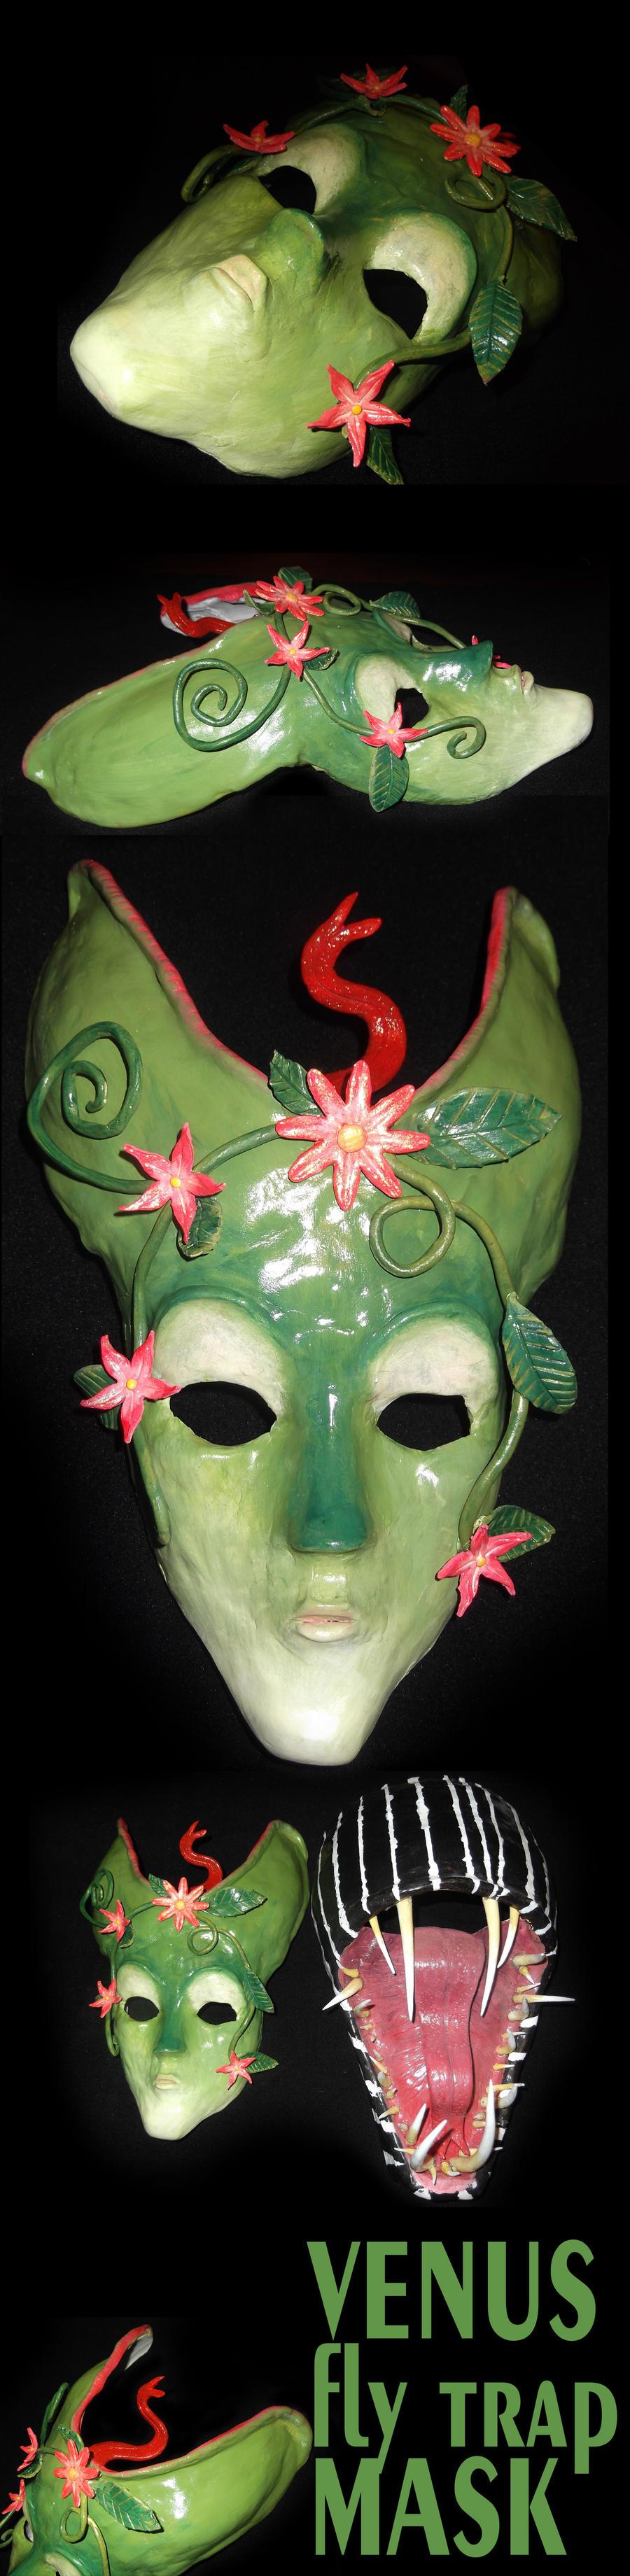 Venus Fly Trap Mask by Transformergirl